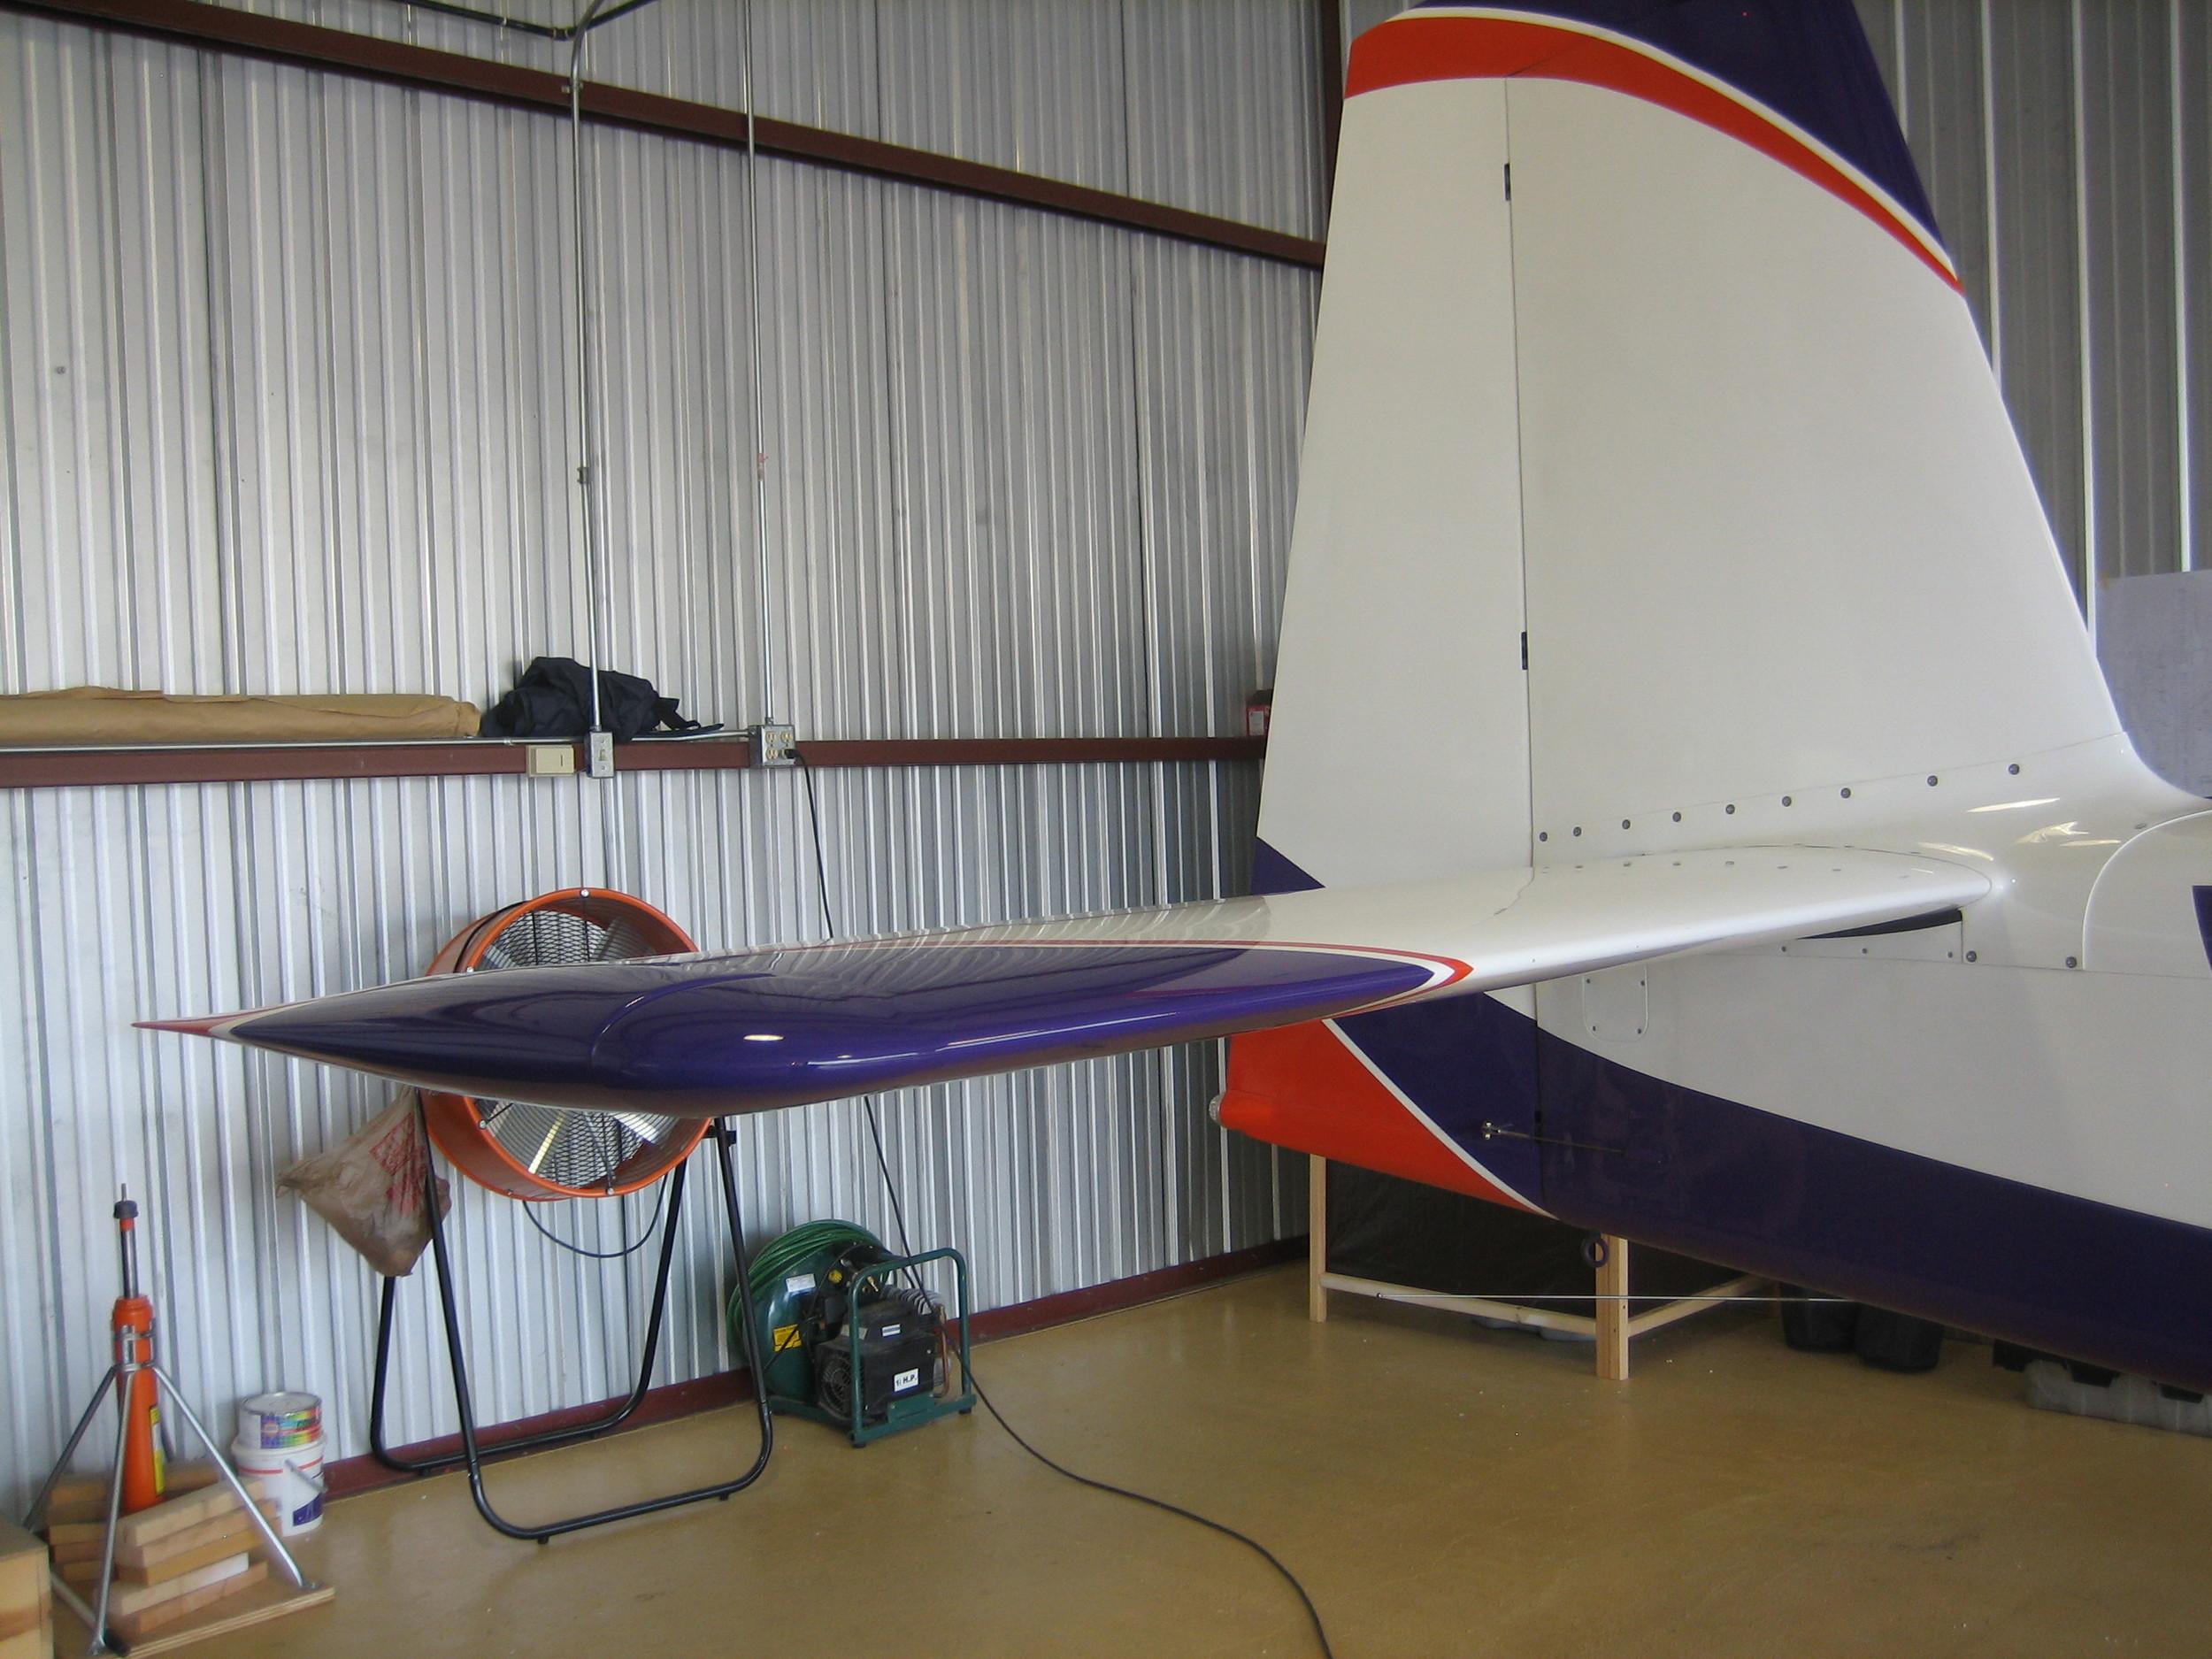 RV-10 Dnever 047.JPG